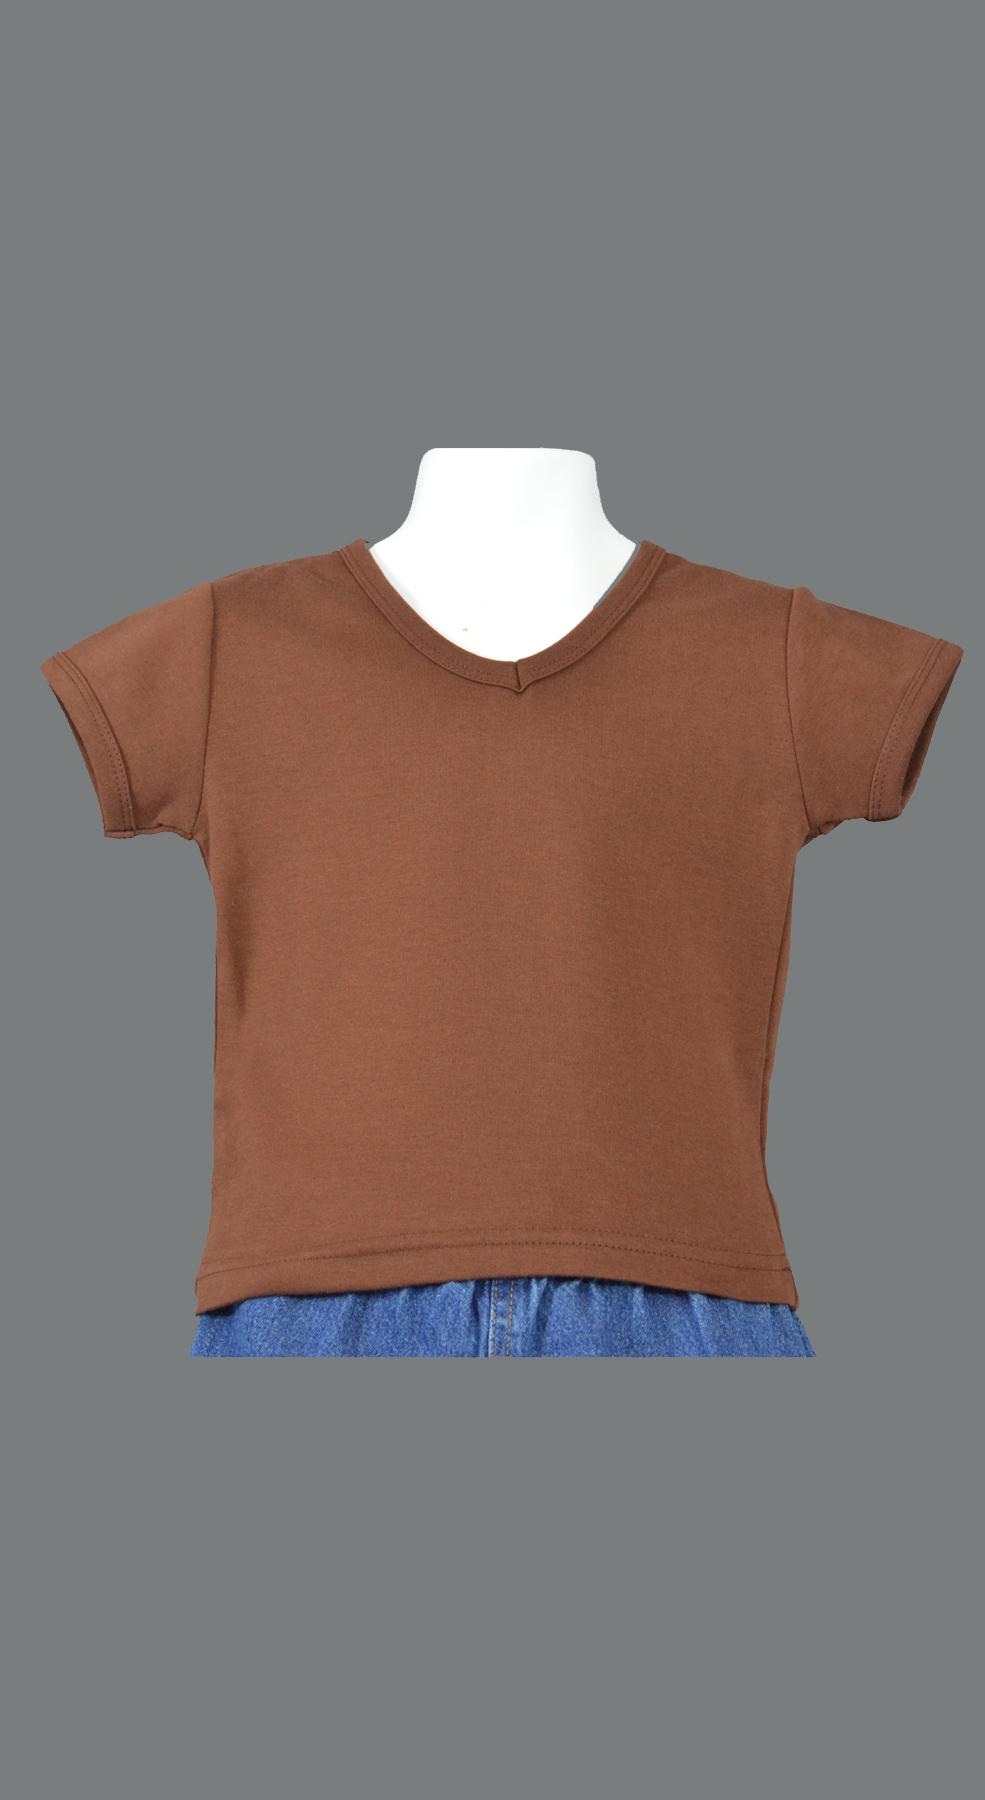 Monag 400016 - Interlock Short Sleeve V-Neck Tee